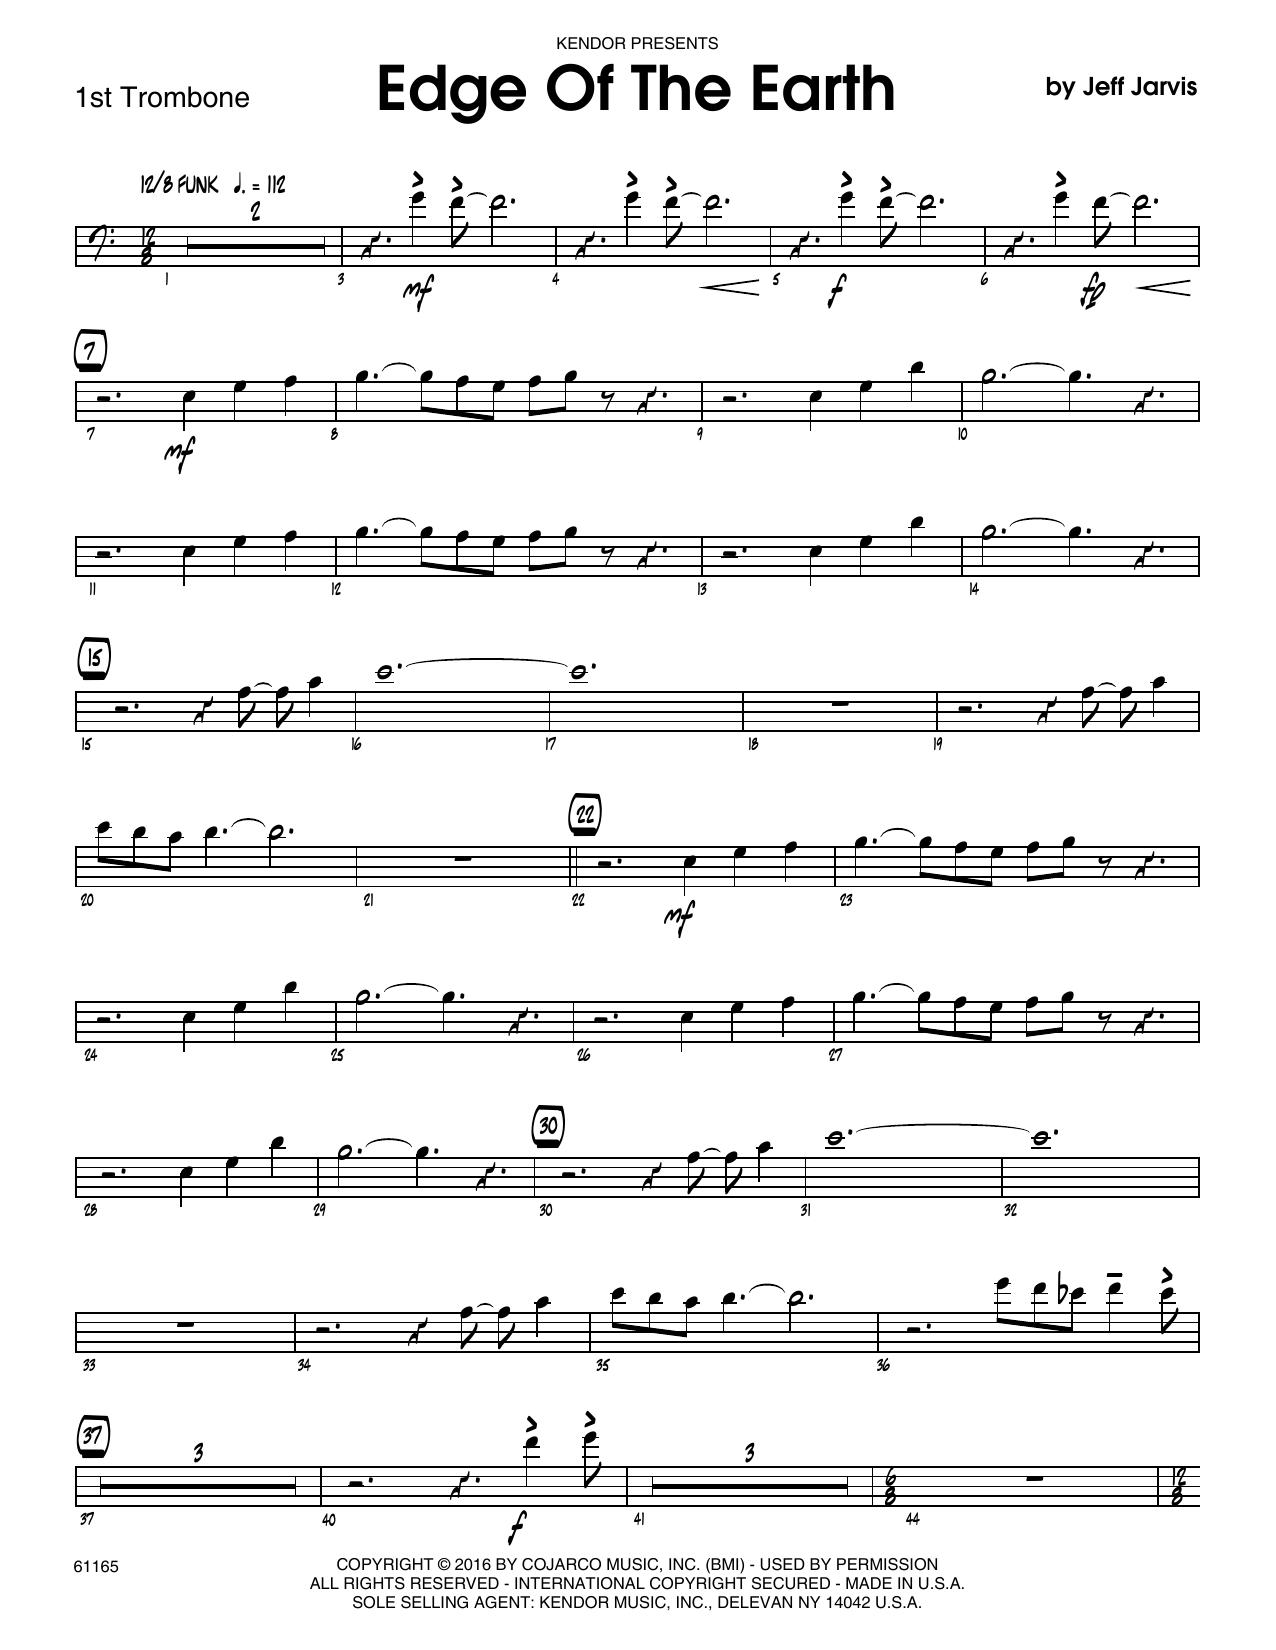 Edge Of The Earth - 1st Trombone Sheet Music